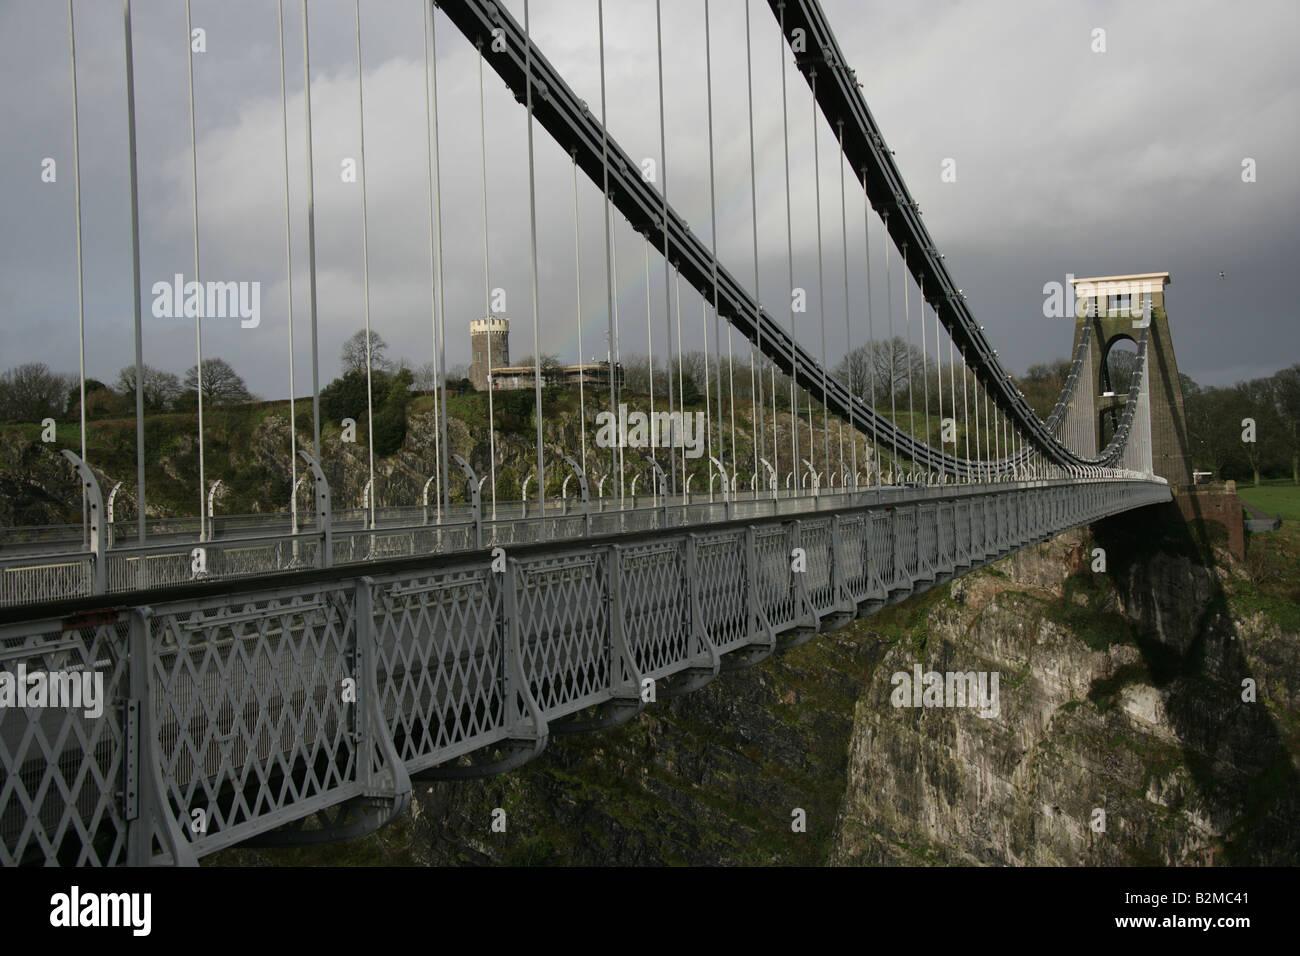 City of Bristol, England. The Isambard Kingdom Brunel designed Clifton Suspension Bridge over the Avon Gorge and - Stock Image